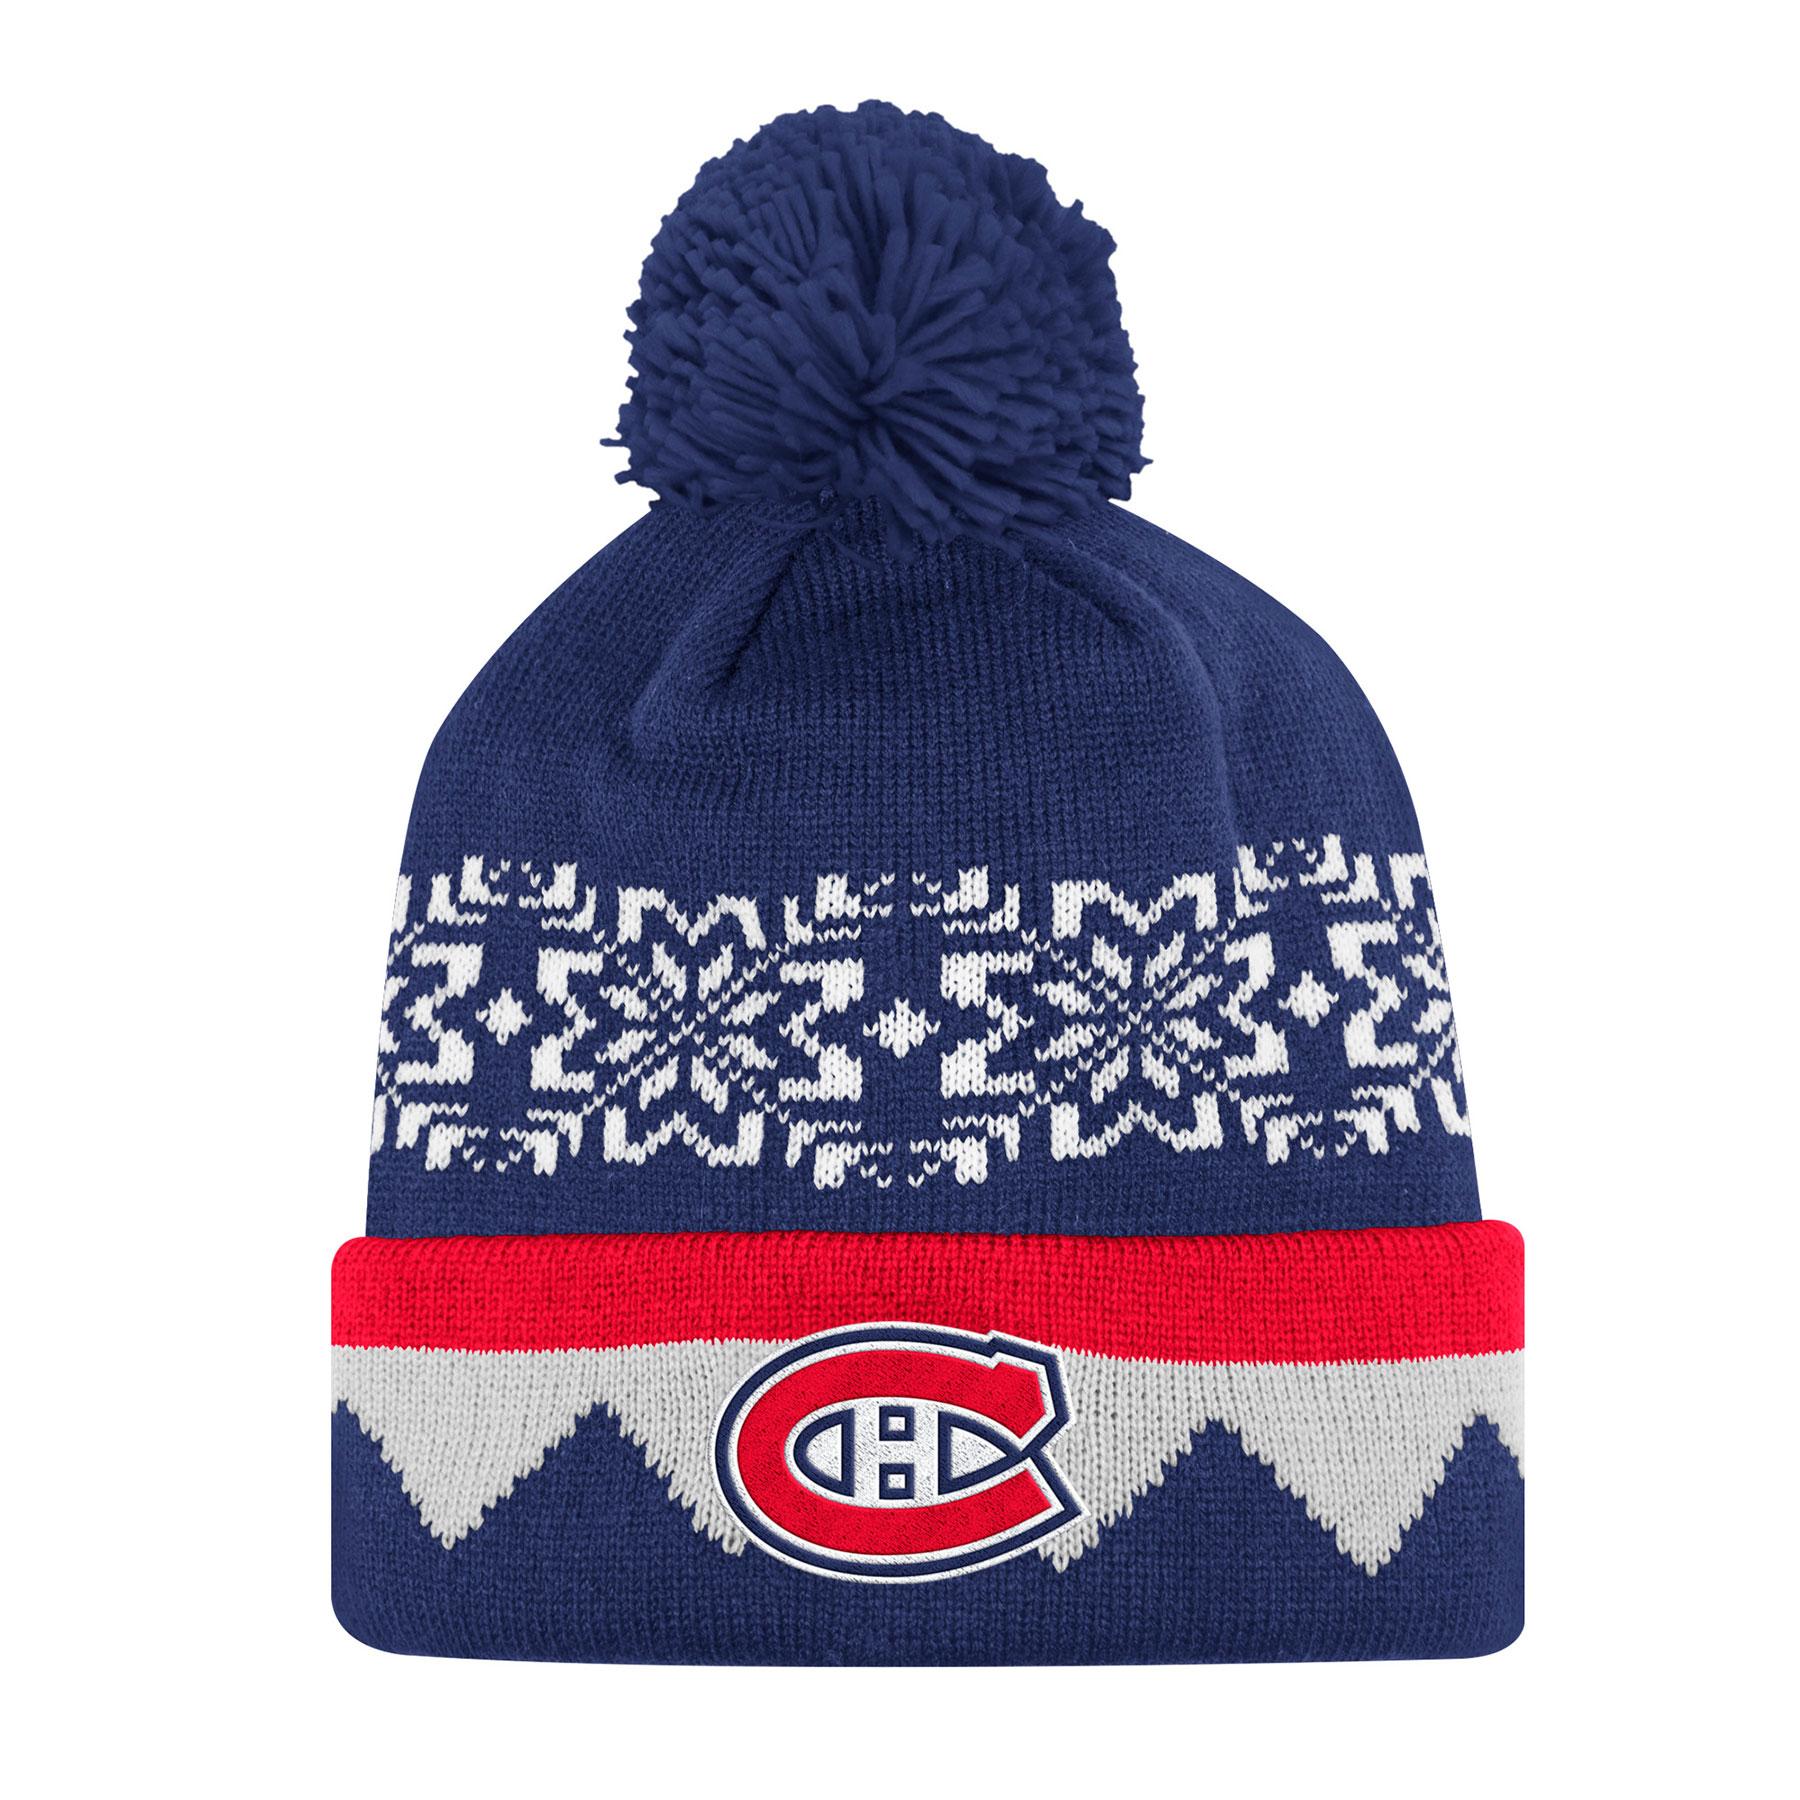 Montreal Canadiens adidas NHL Snowflake Cuffed Pom Knit Hat 10b7345dc12f